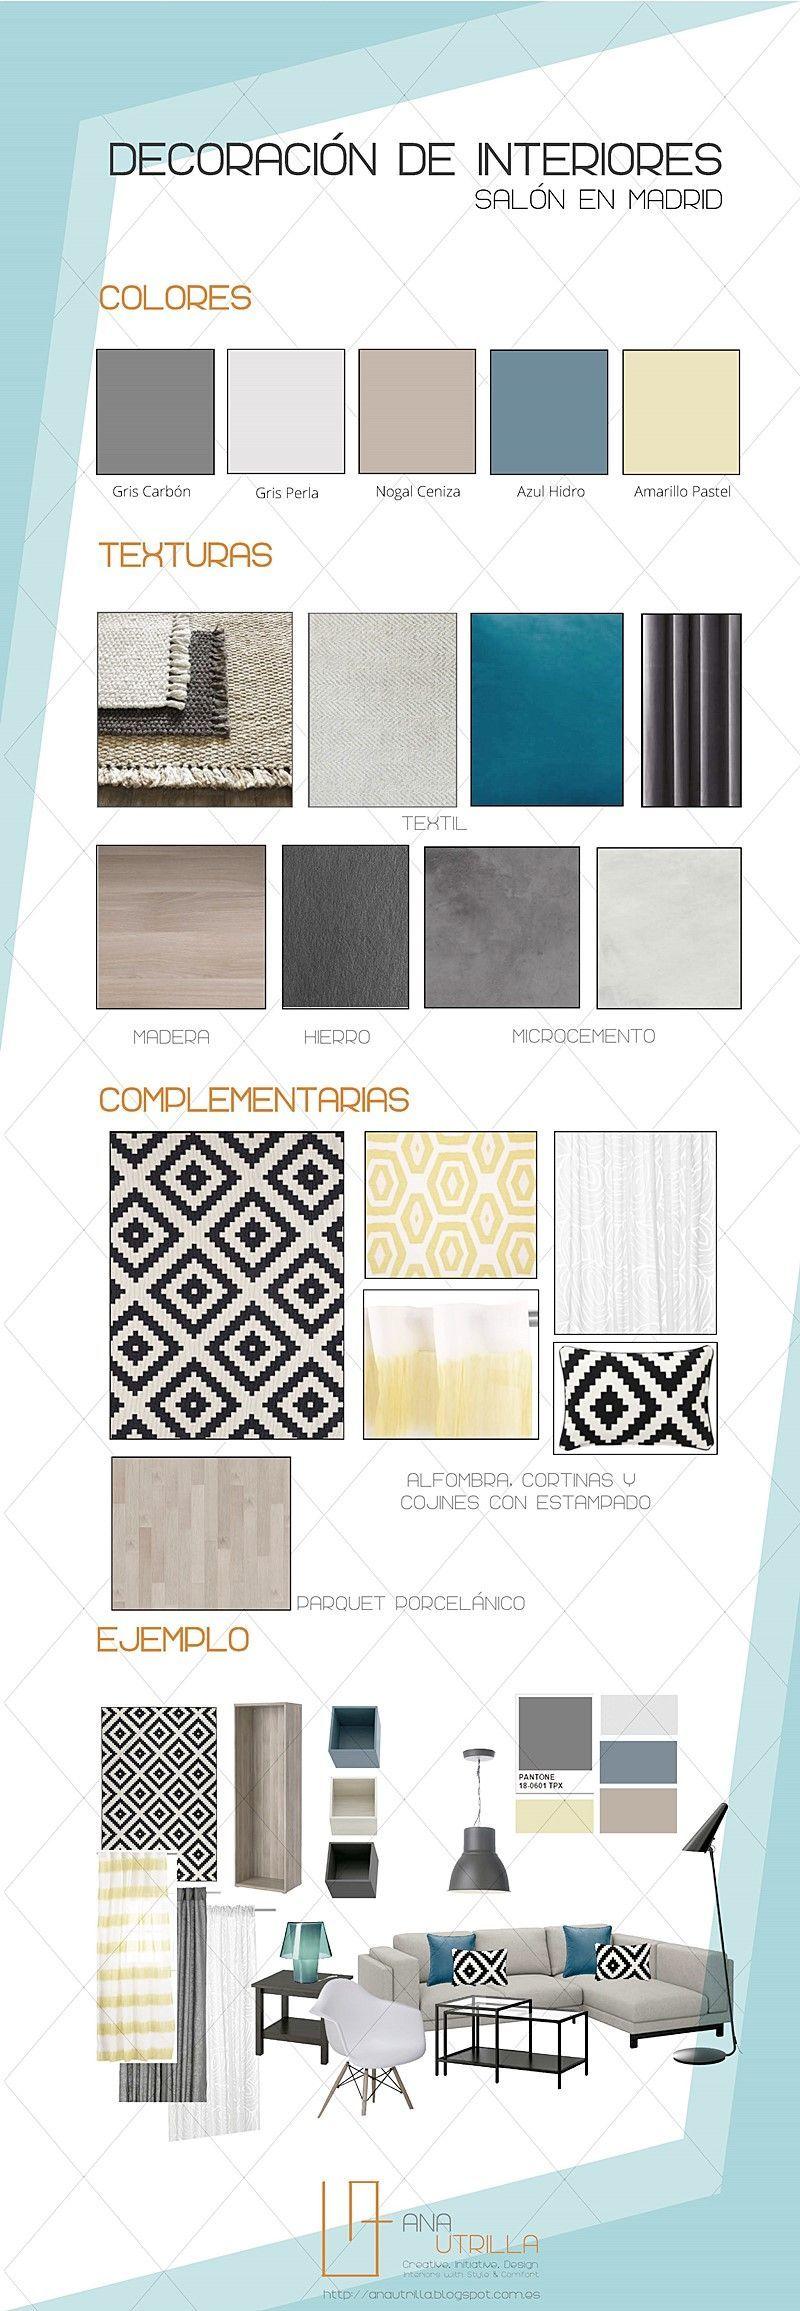 infografia-diseno-interiores-madrid-salon-ana-utrilla-min